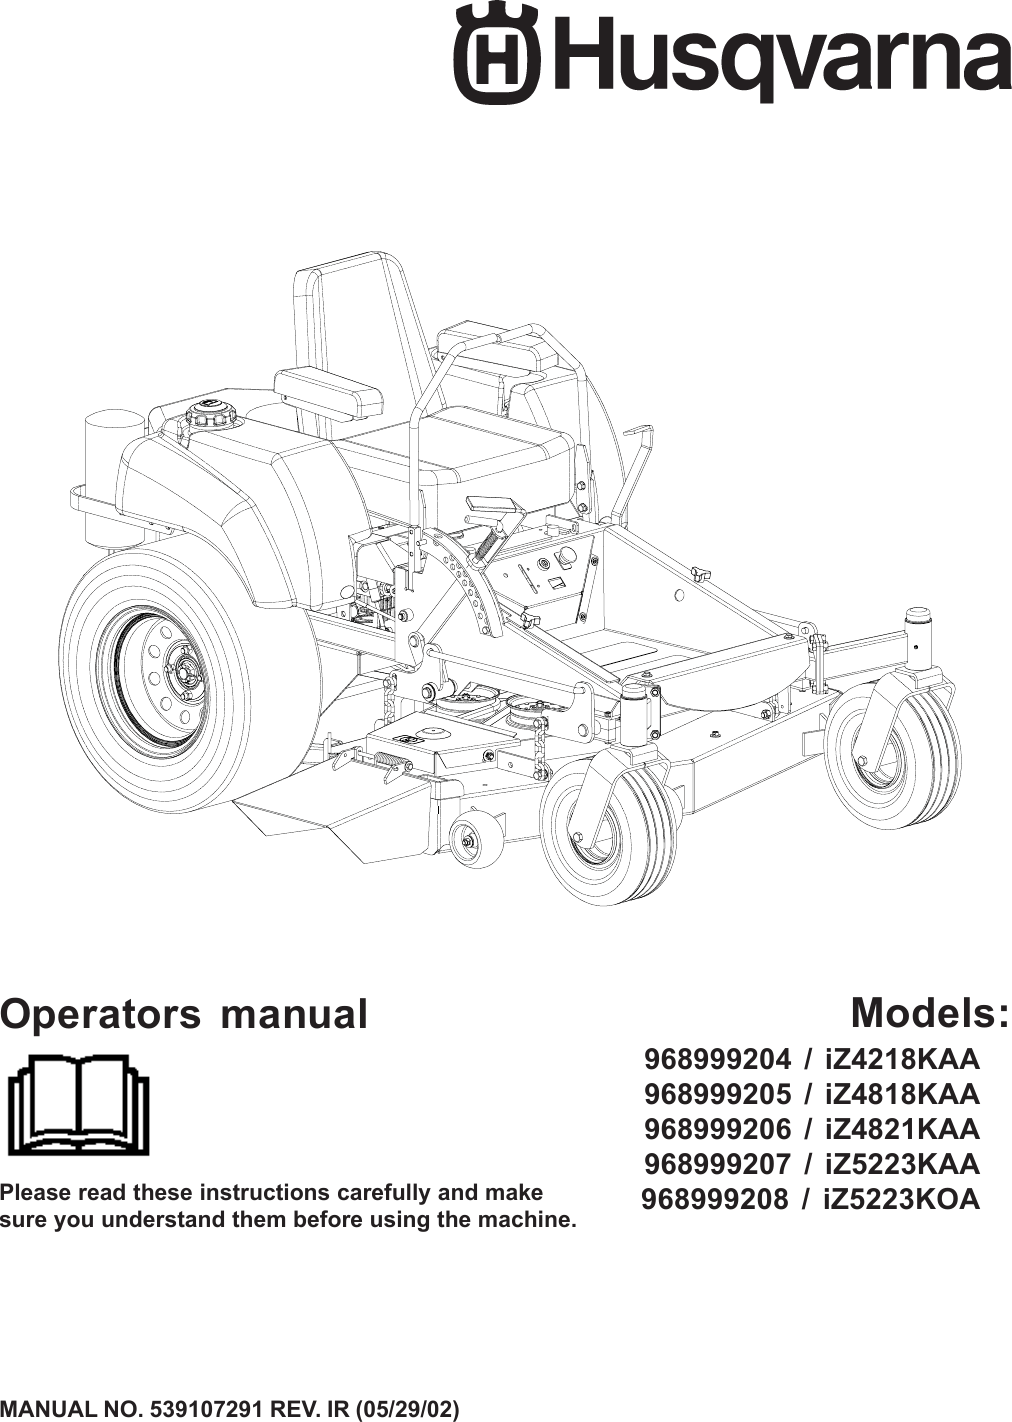 Husqvarna 968999204 Iz4218Kaa Users Manual Operator's